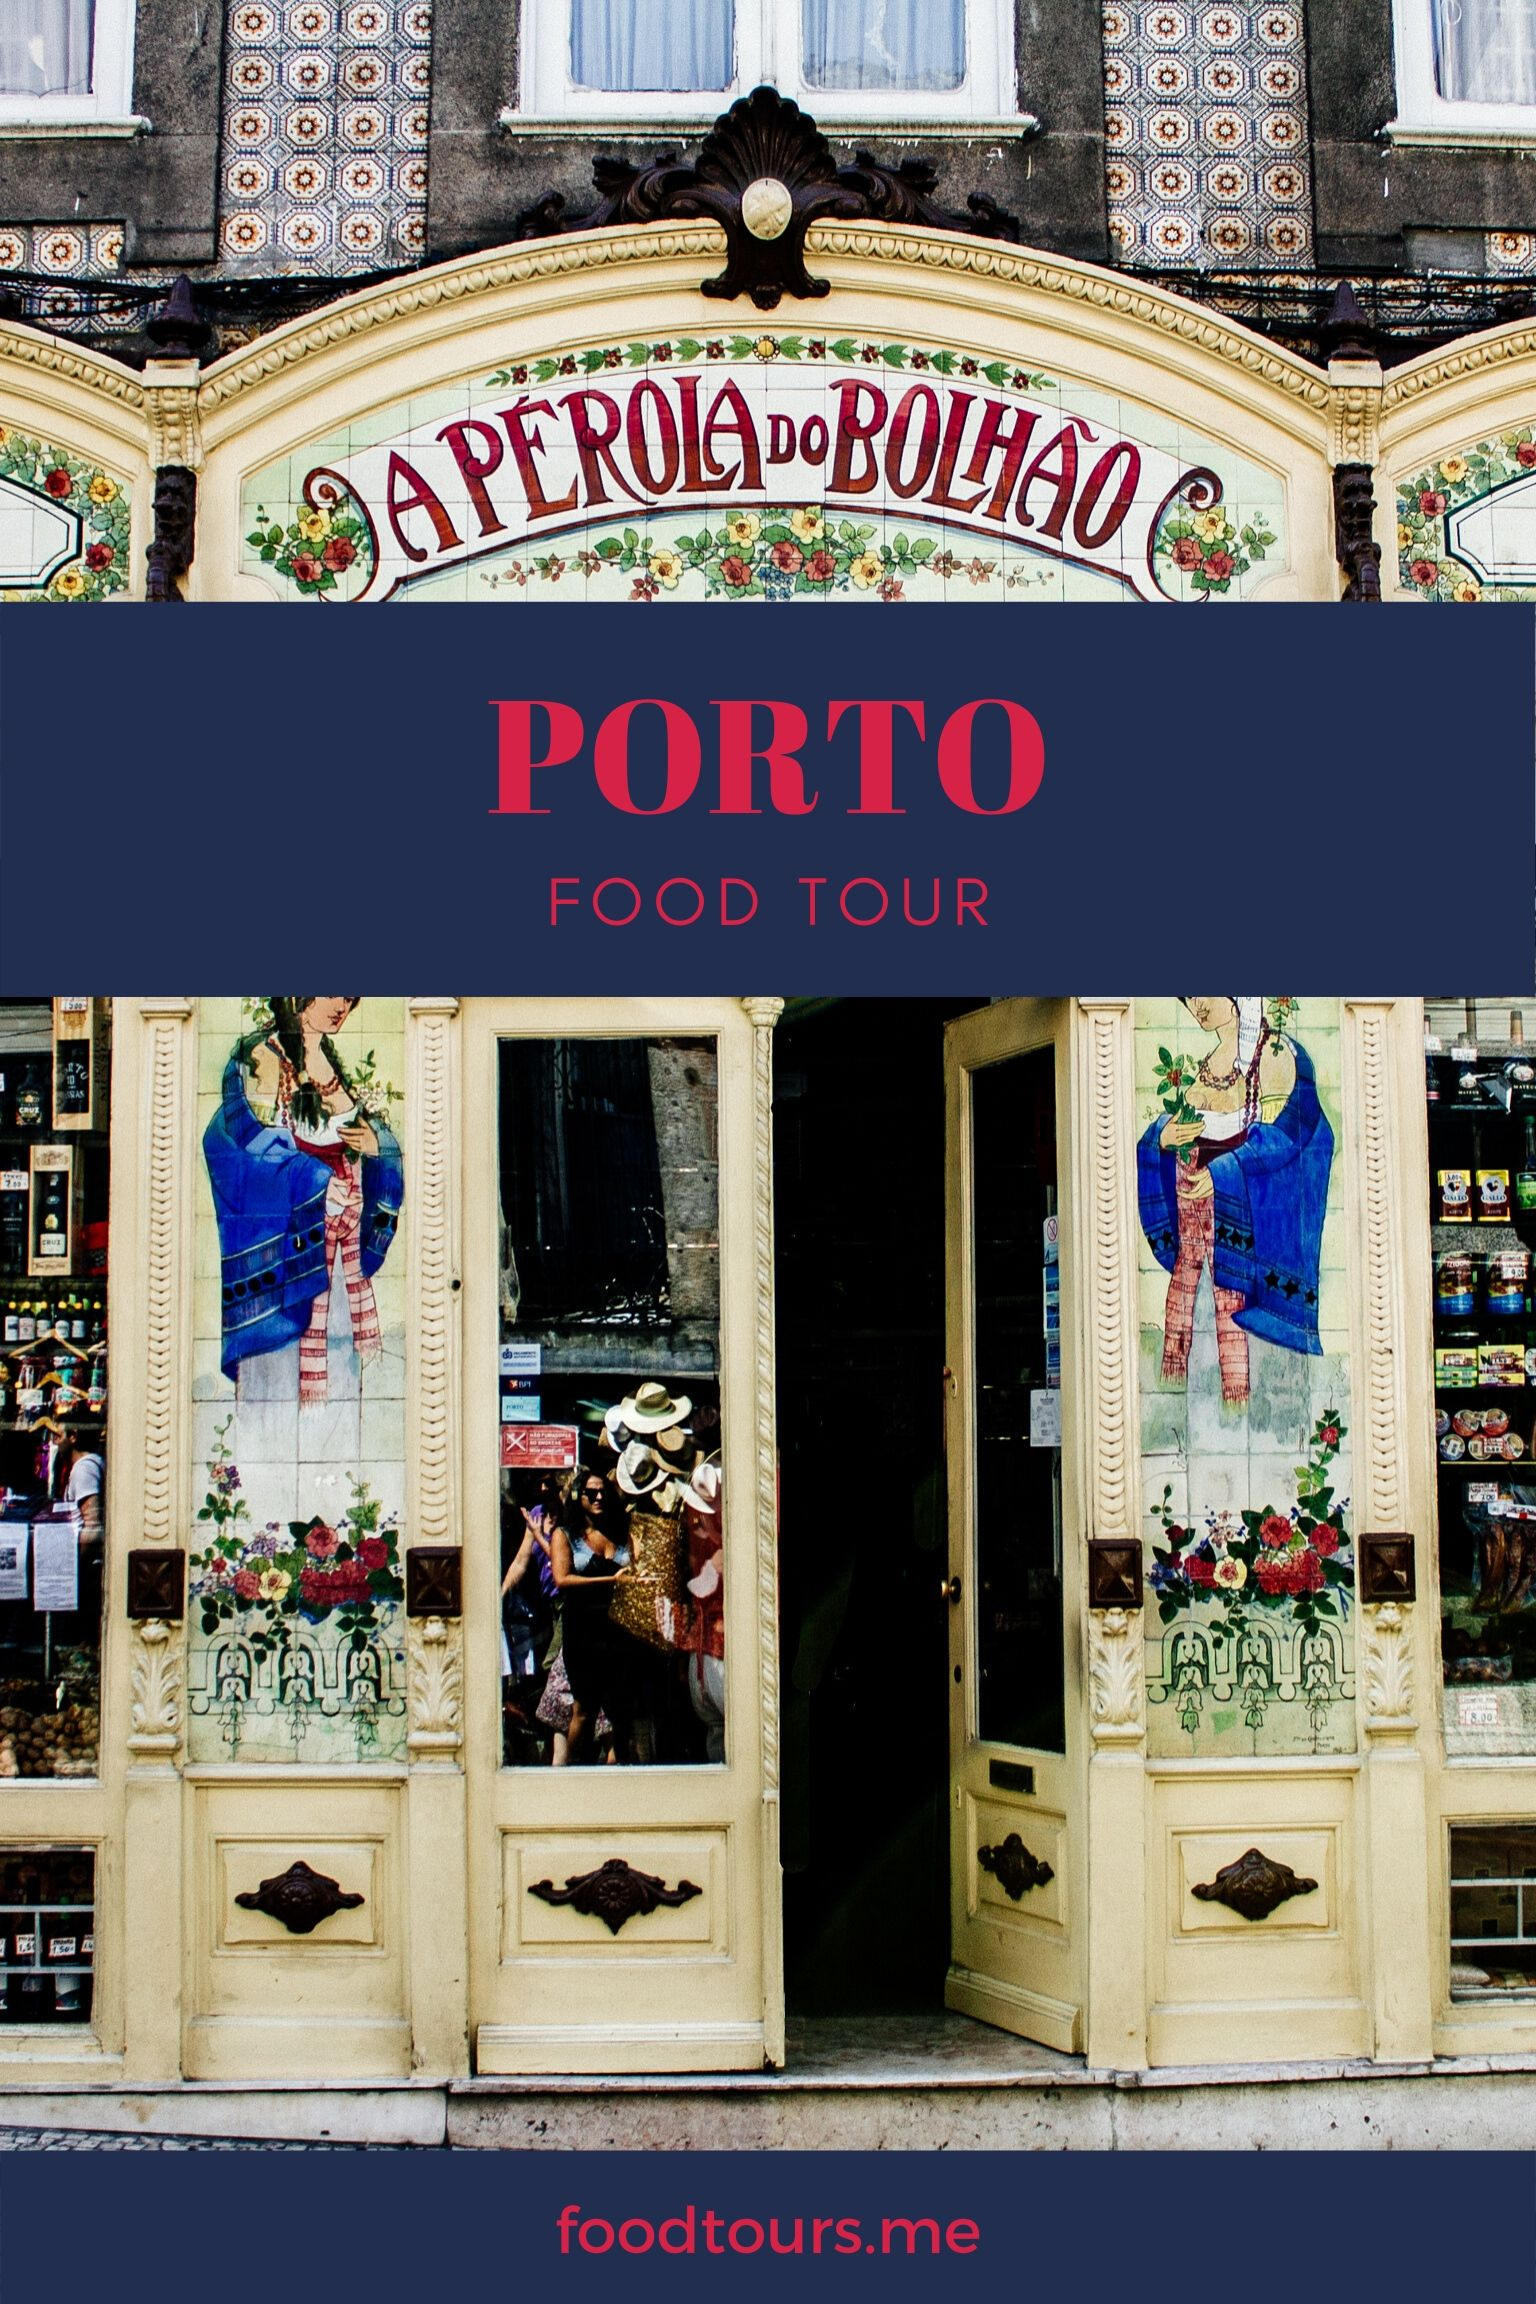 Classic Porto Shop Front